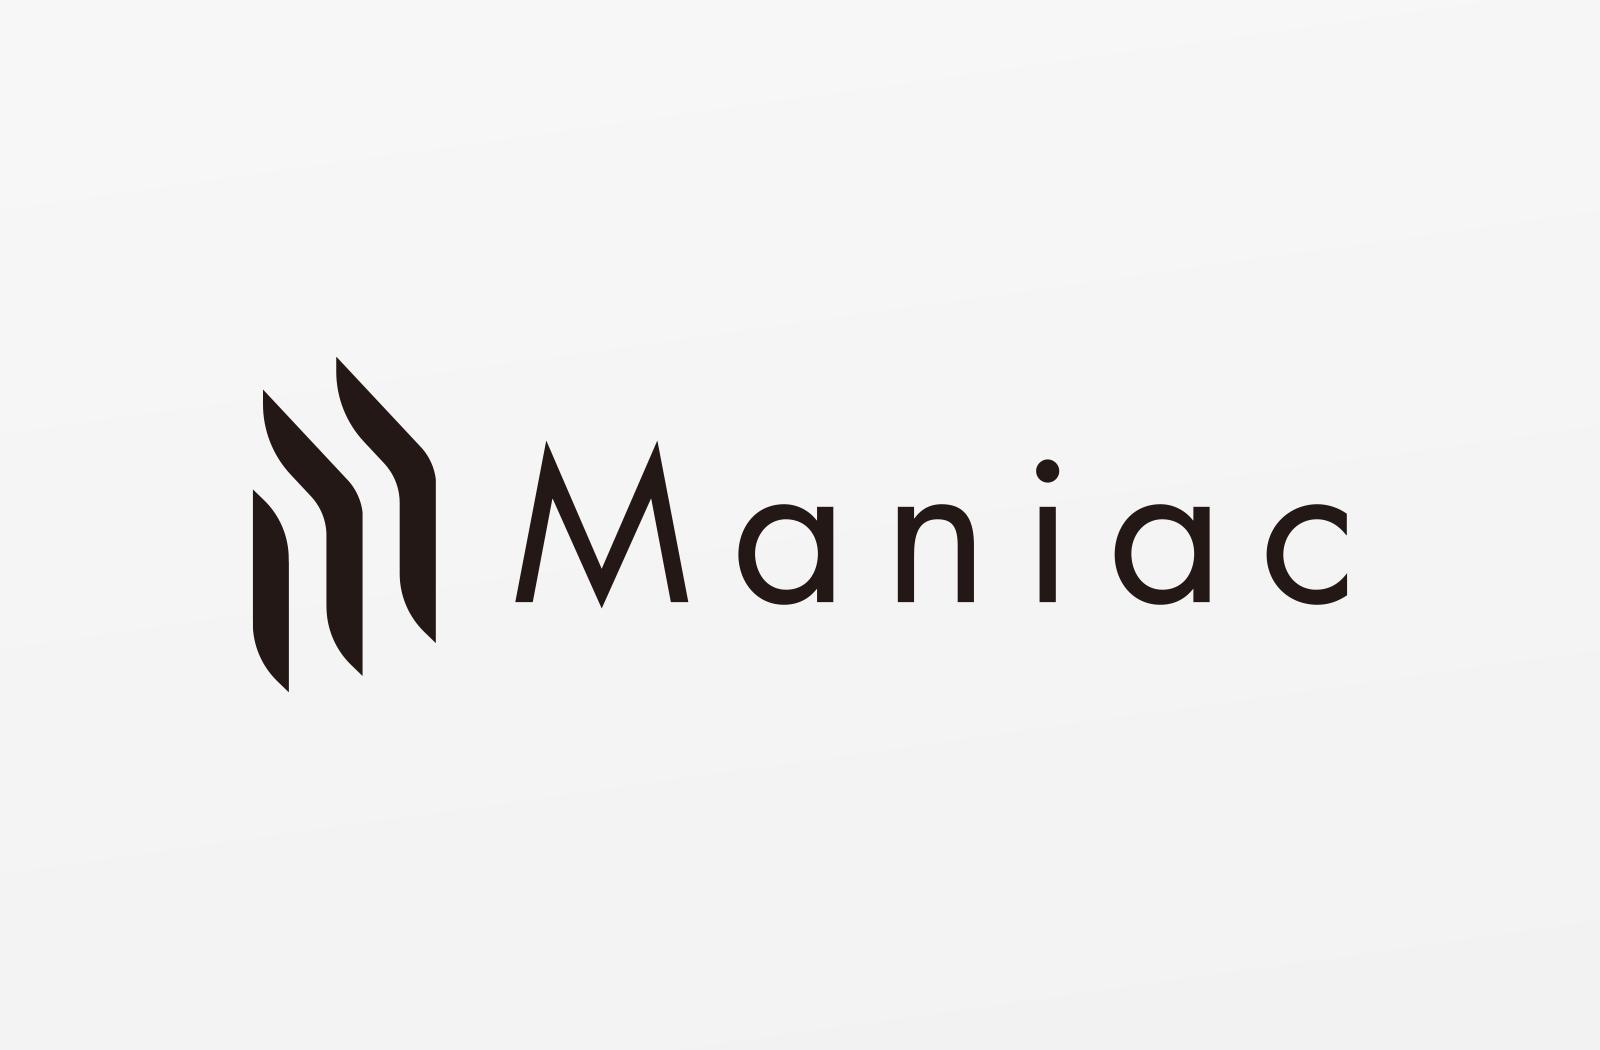 Maniac ロゴデザイン